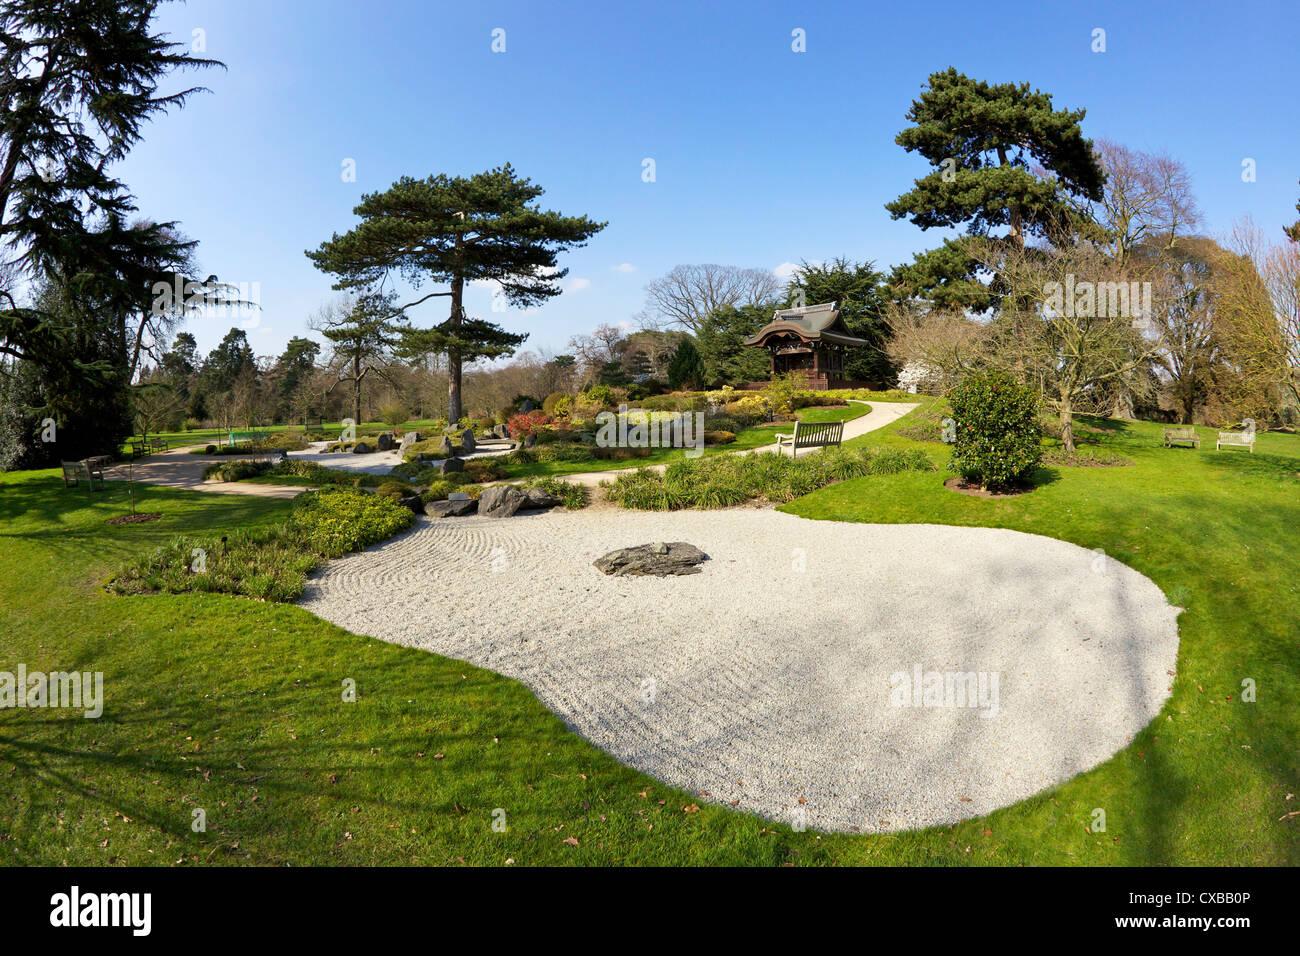 Japanese Gateway Chokushi-Mon, Gateway di Imperial Messenger, Royal Botanic Gardens, Kew, Sito Patrimonio Mondiale dell'UNESCO, Londra Foto Stock